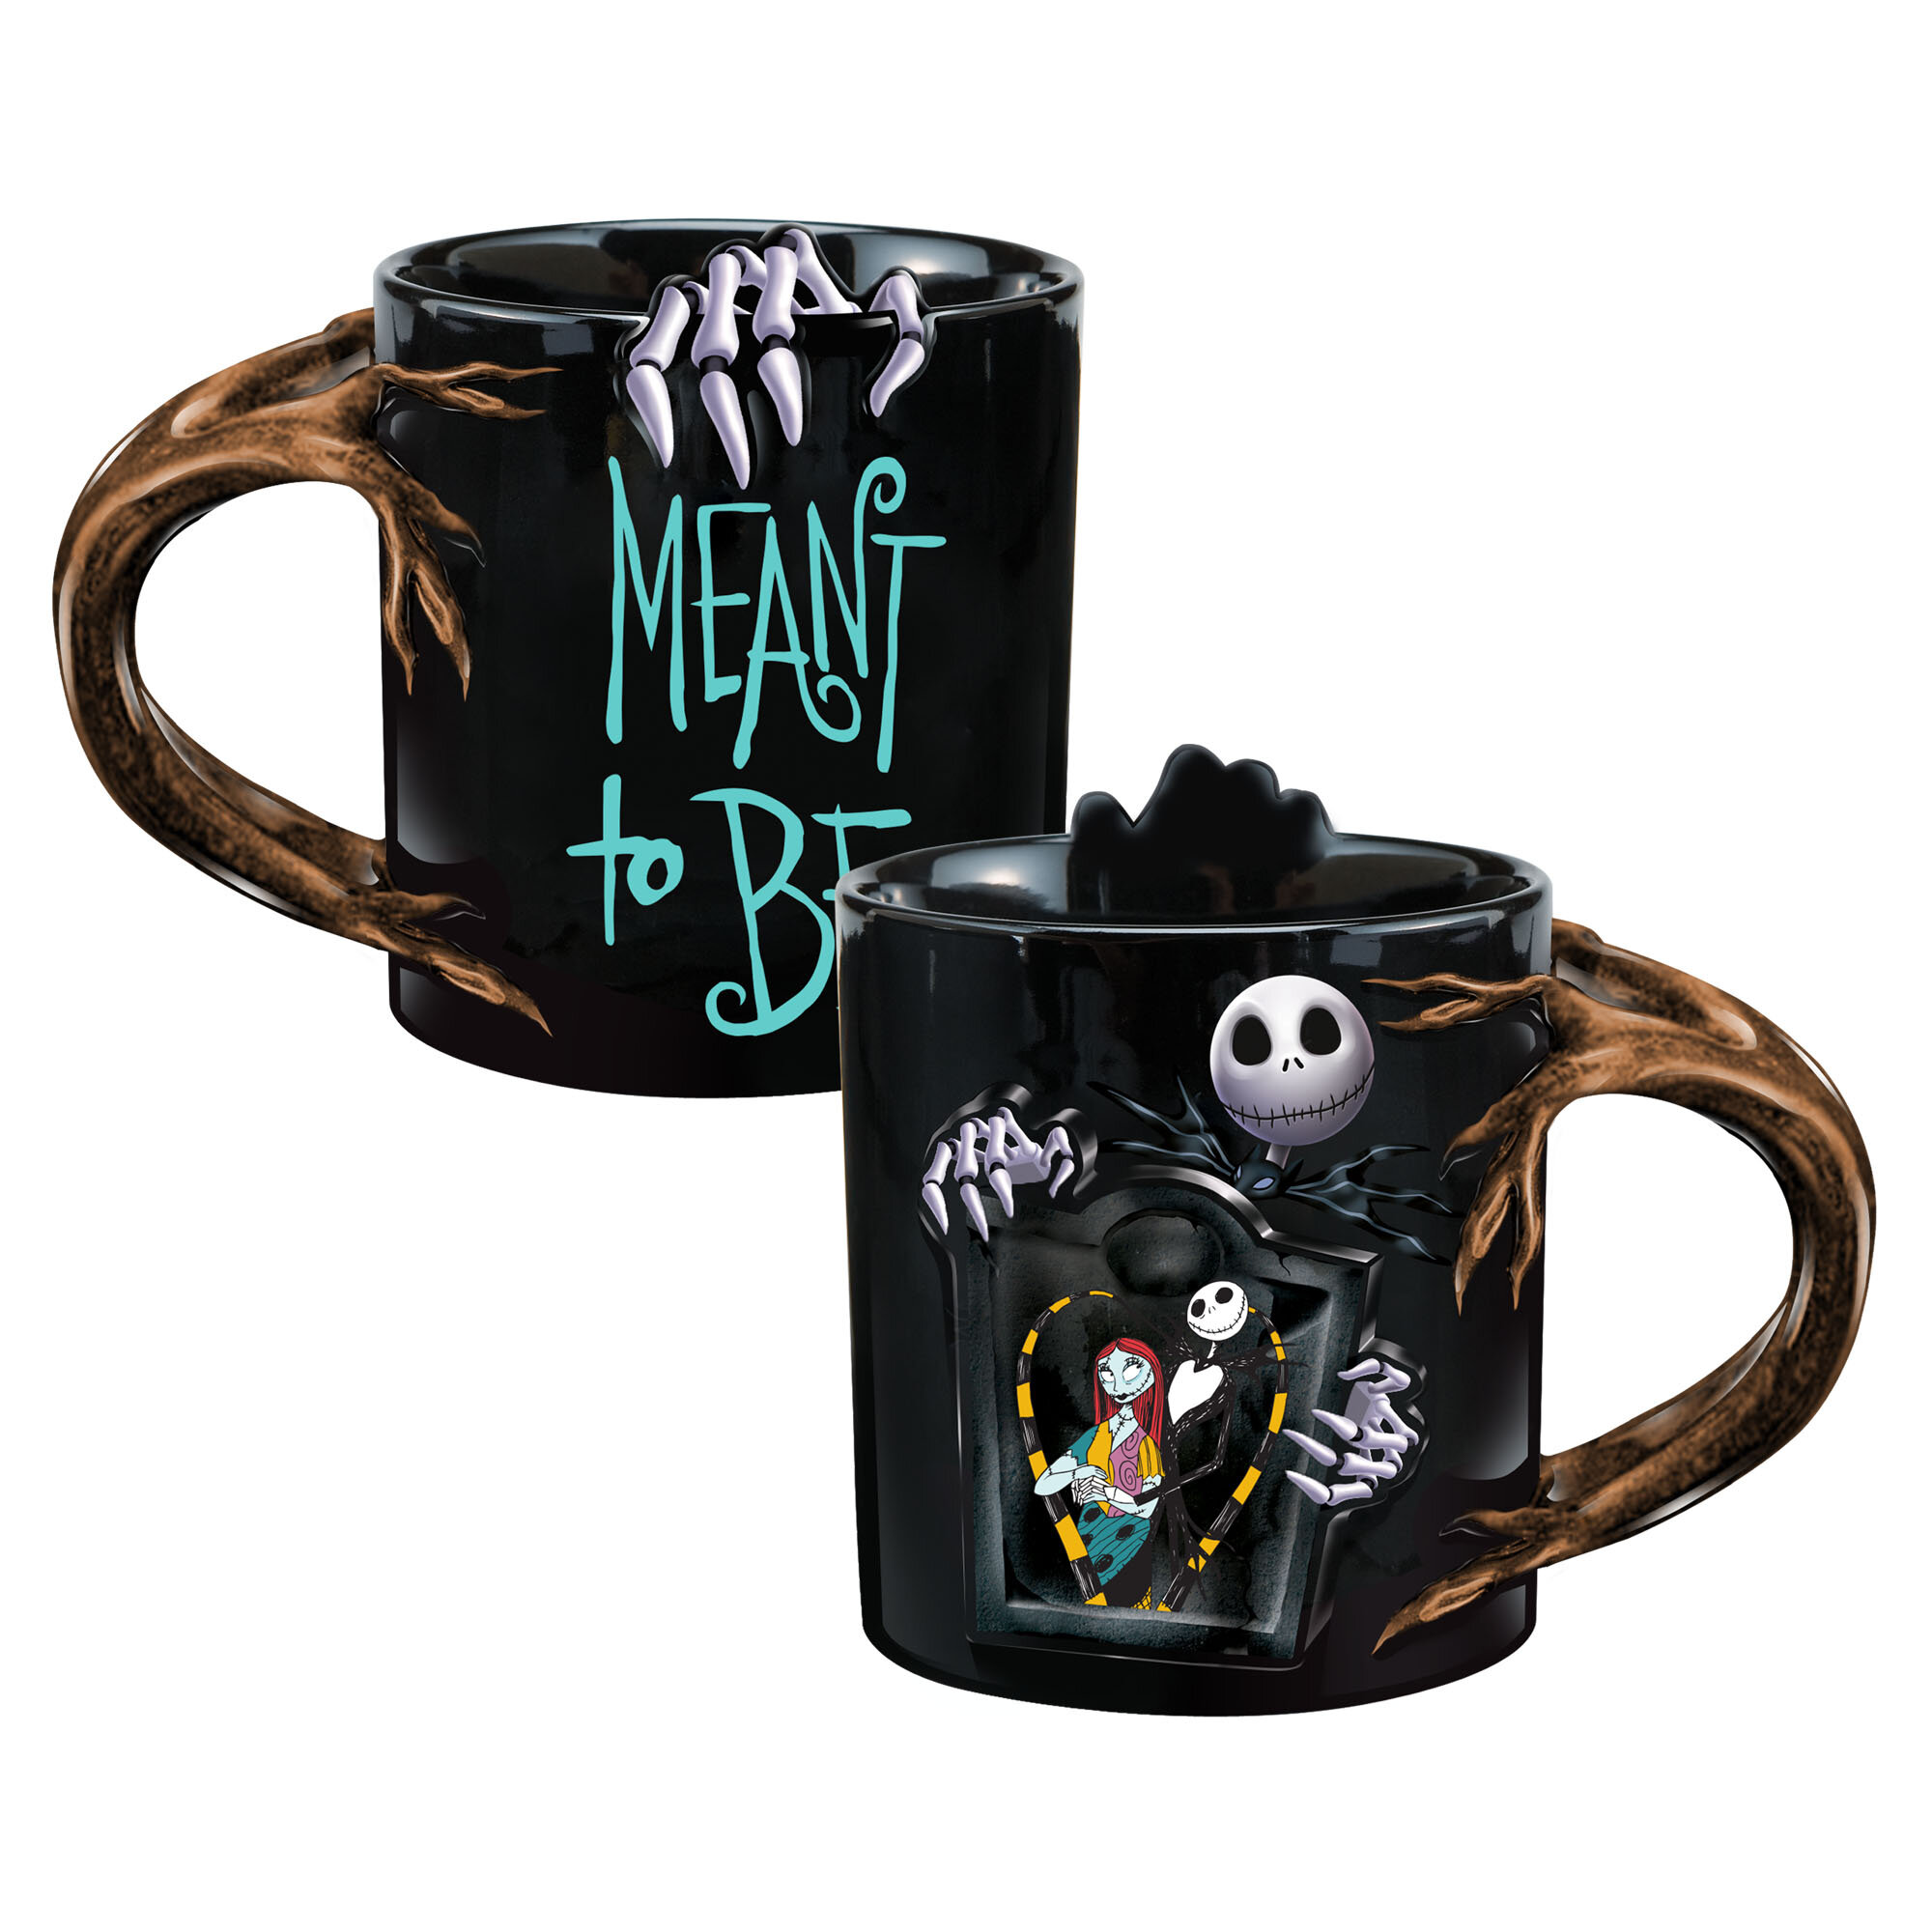 Nightmare Before Christmas Coffee Mug.Vandor Nightmare Before Christmas Heat Reactive Coffee Mug